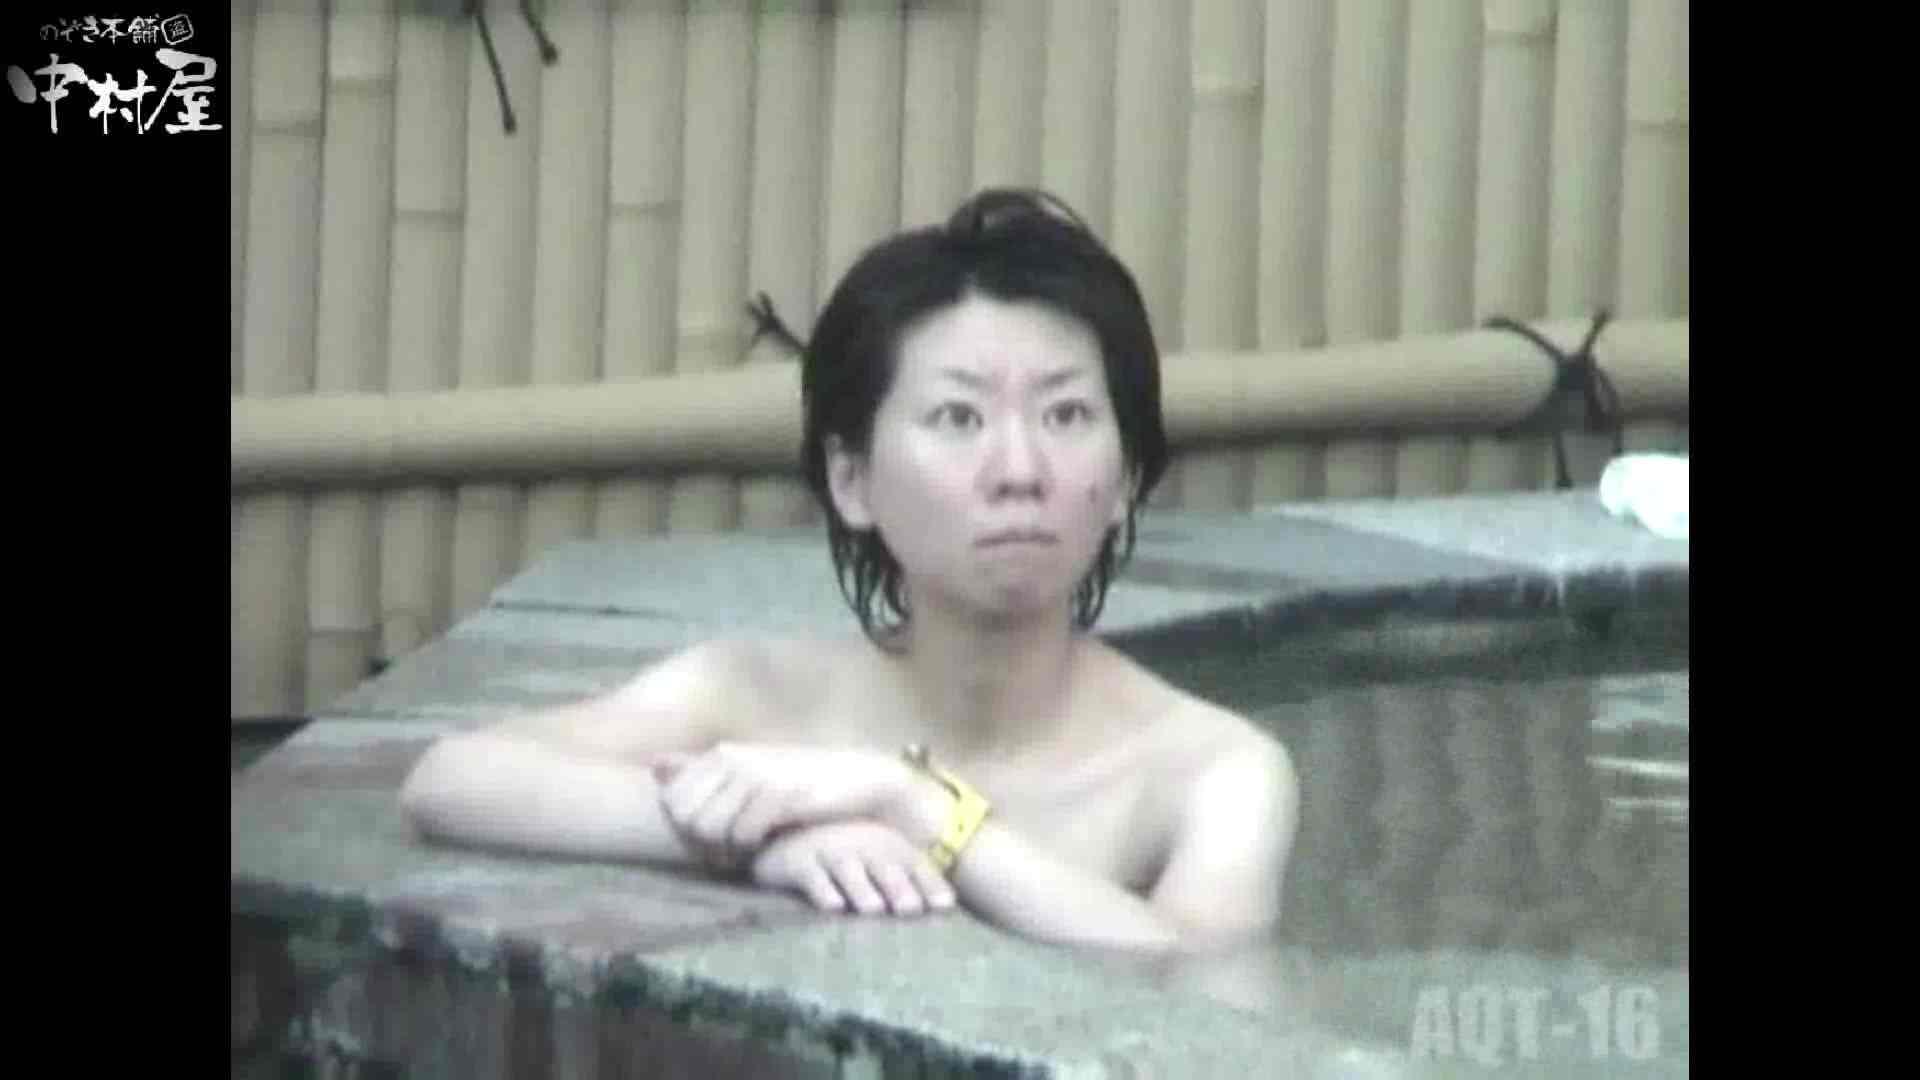 Aquaな露天風呂Vol.880潜入盗撮露天風呂十六判湯 其の三 盗撮師作品  100pic 92